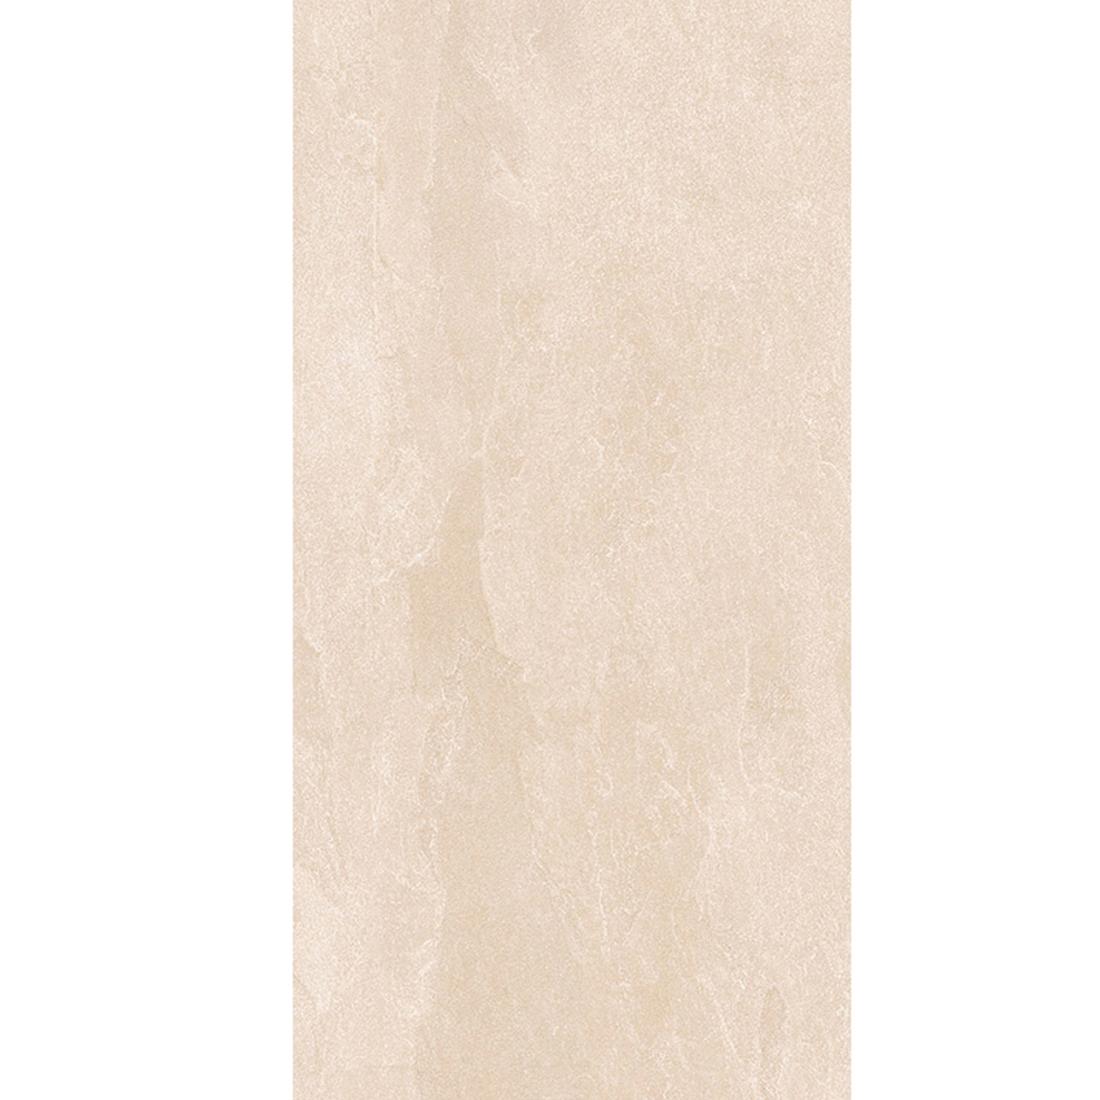 Nitco Nordic Cream N6902 Matte Glazed Vitrified Tile